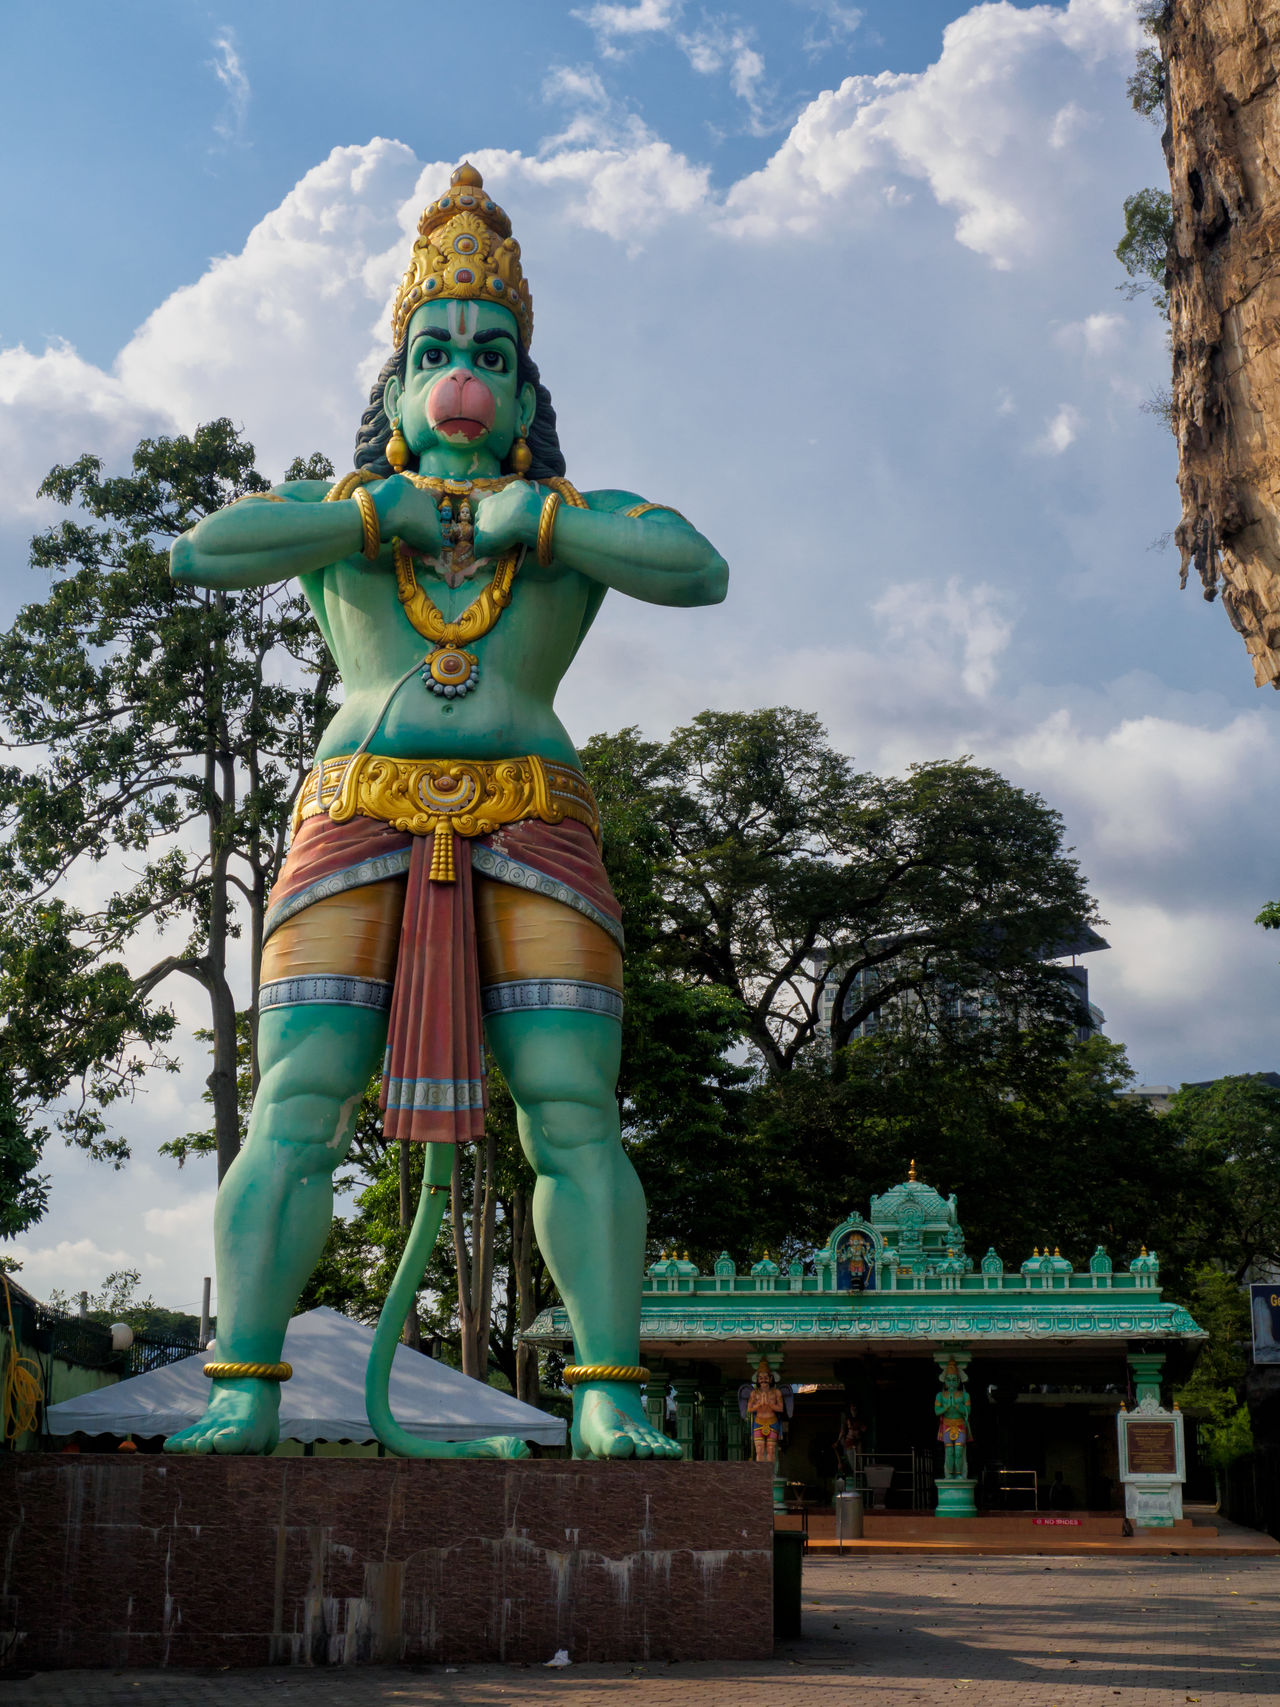 Lord Hanuman deity statue at Batu Caves in Kuala Lumpur, Malaysia Architecture Batu Caves Cultures Day Deity God Hanuman Hinduism Kuala Lumpur Low Angle View Malaysia Monkey No People Outdoors Religion Sculpture Sky Statue